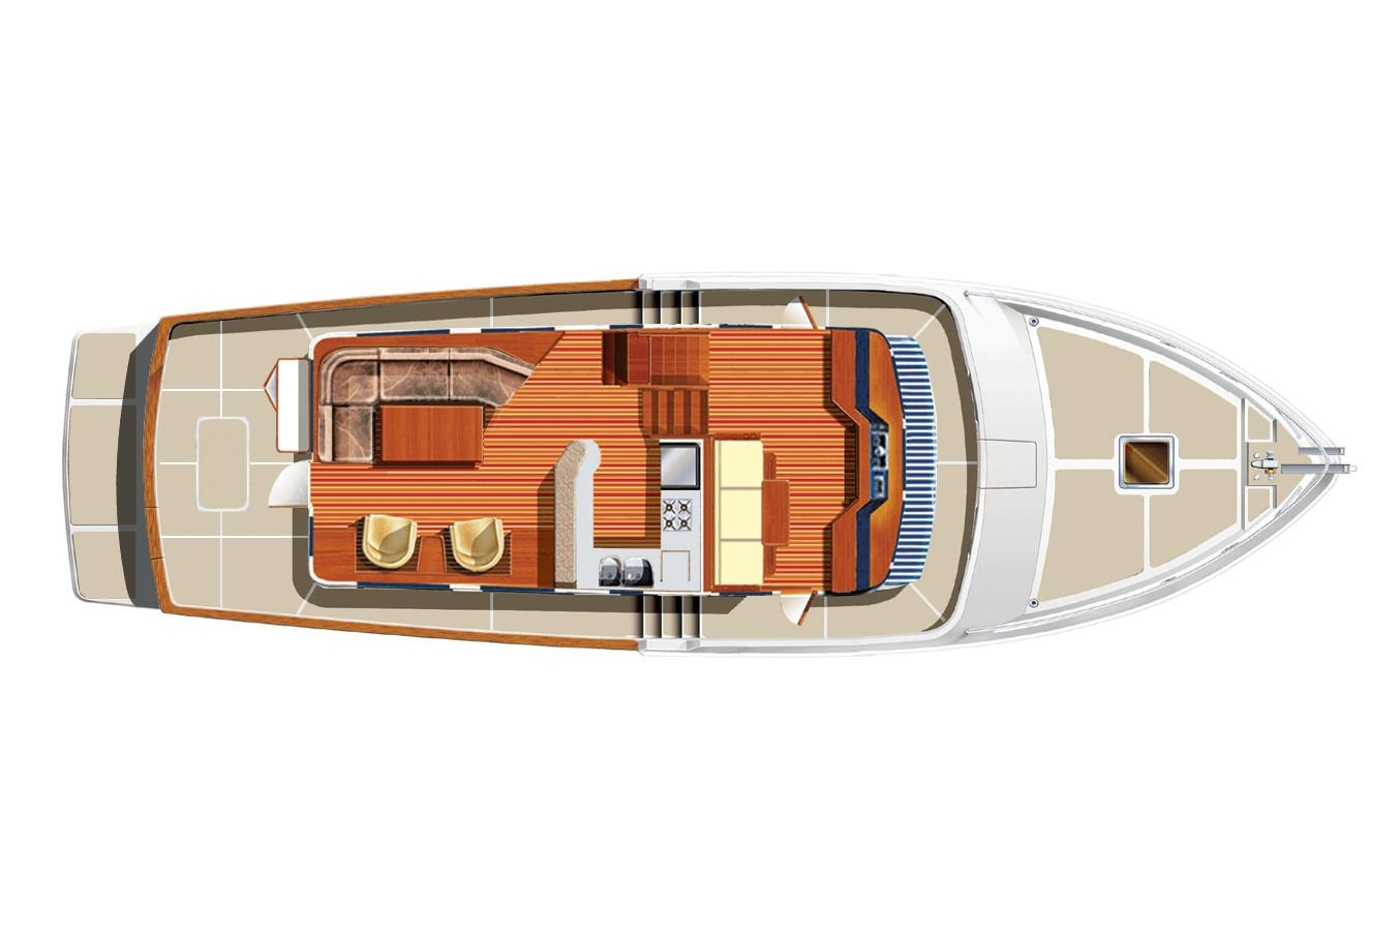 2011 Selene 45, Main deck layout